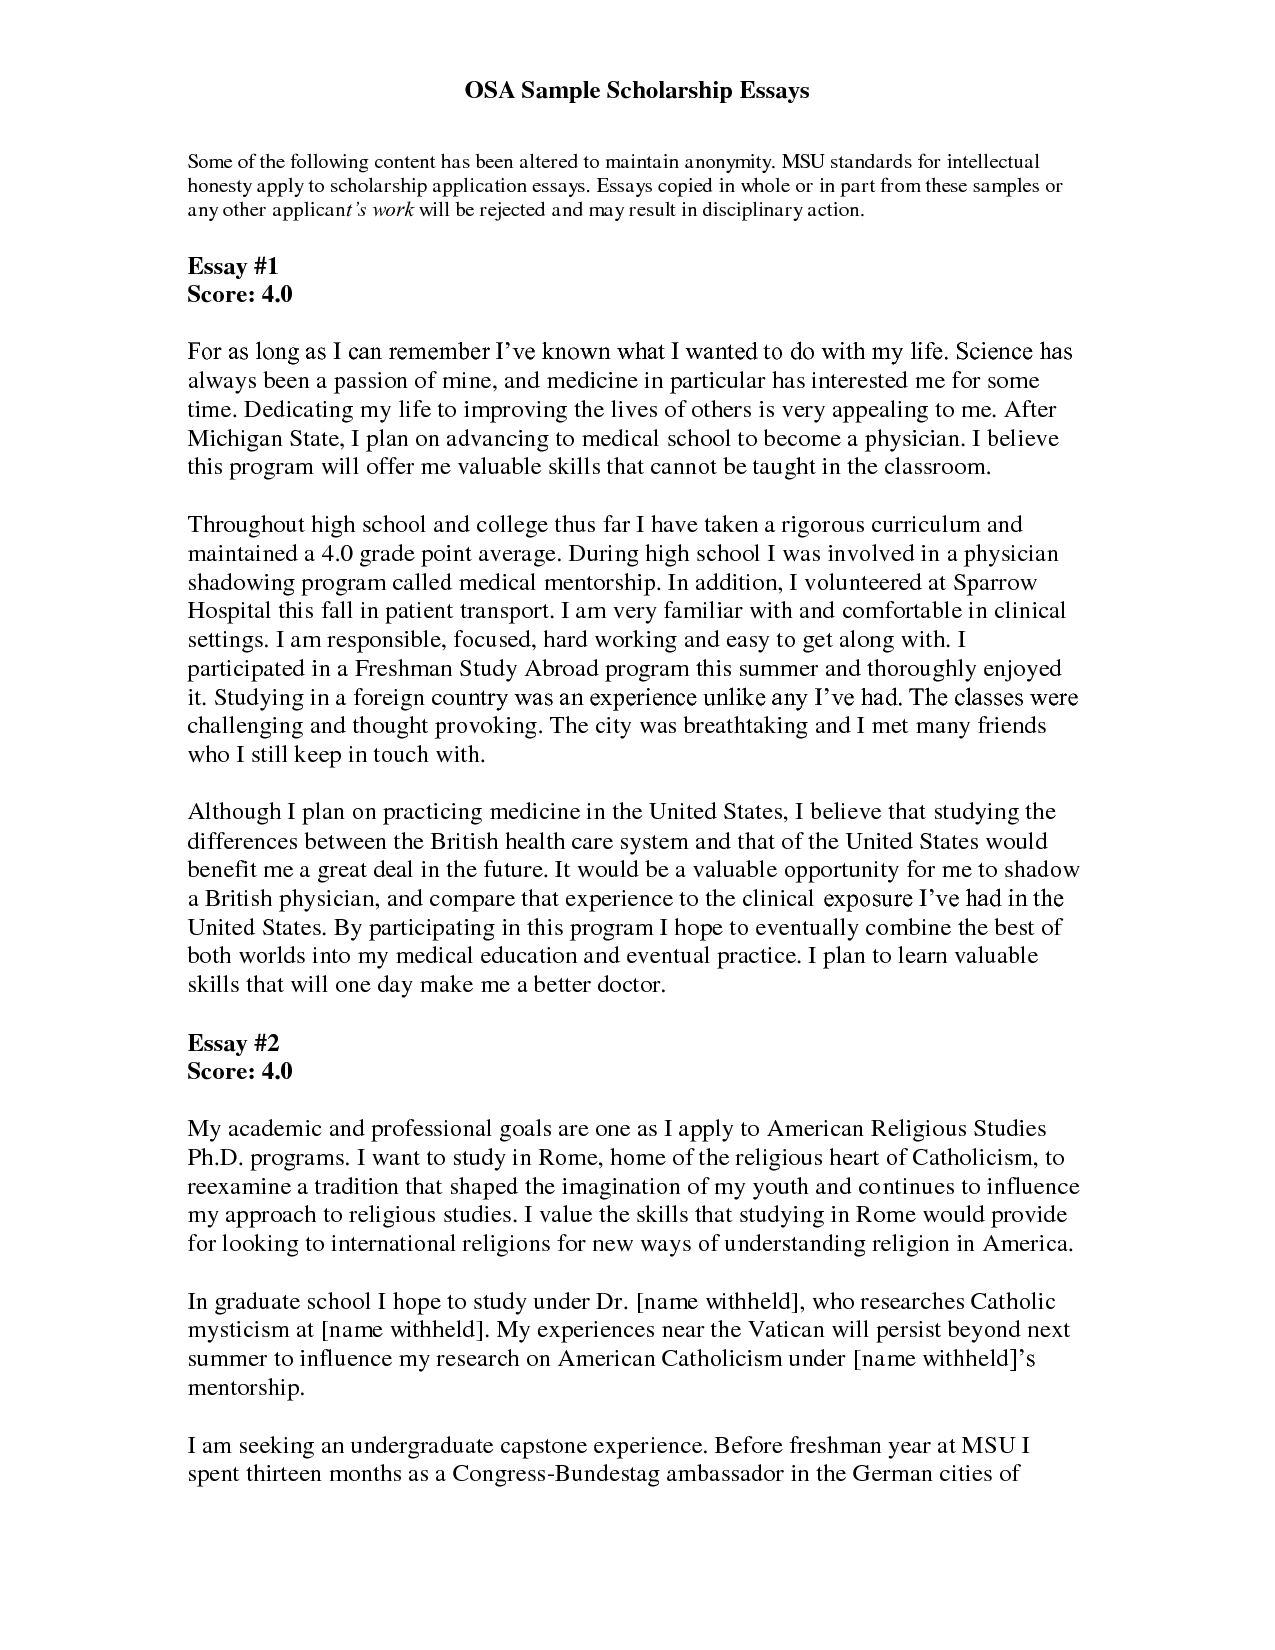 019 Scholarships For Writing Essays Scholarship Essay Writer How To Apply Texas Topics 9axjh Dreaded B Examples A 2017 C Full